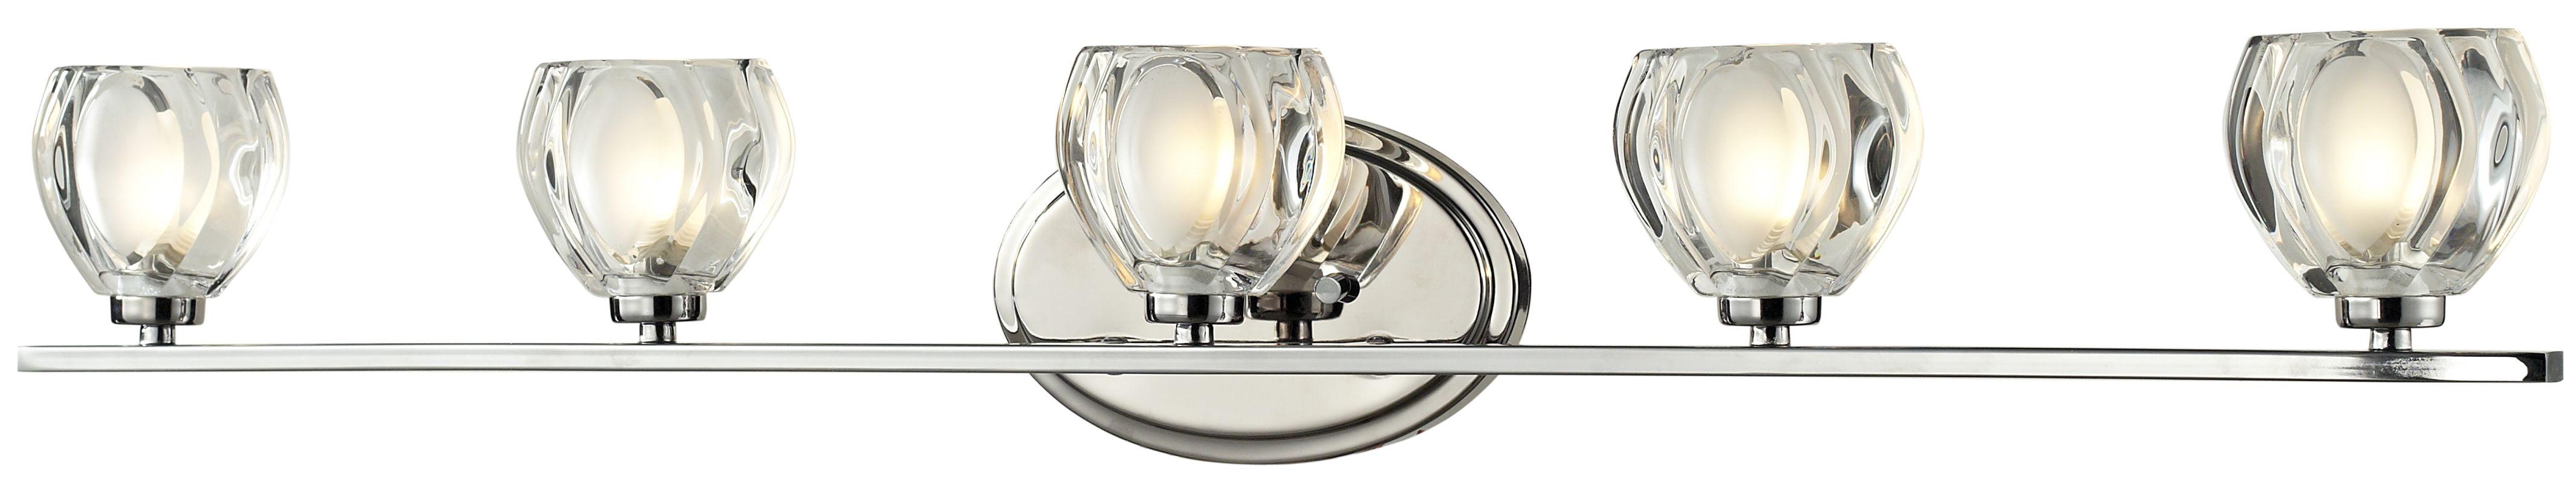 Z-Lite 3023-5V Hale 5 Light ADA Compliant Bathroom Vanity Light with Sale $386.00 ITEM: bci2373781 ID#:3023-5V UPC: 685659027891 :